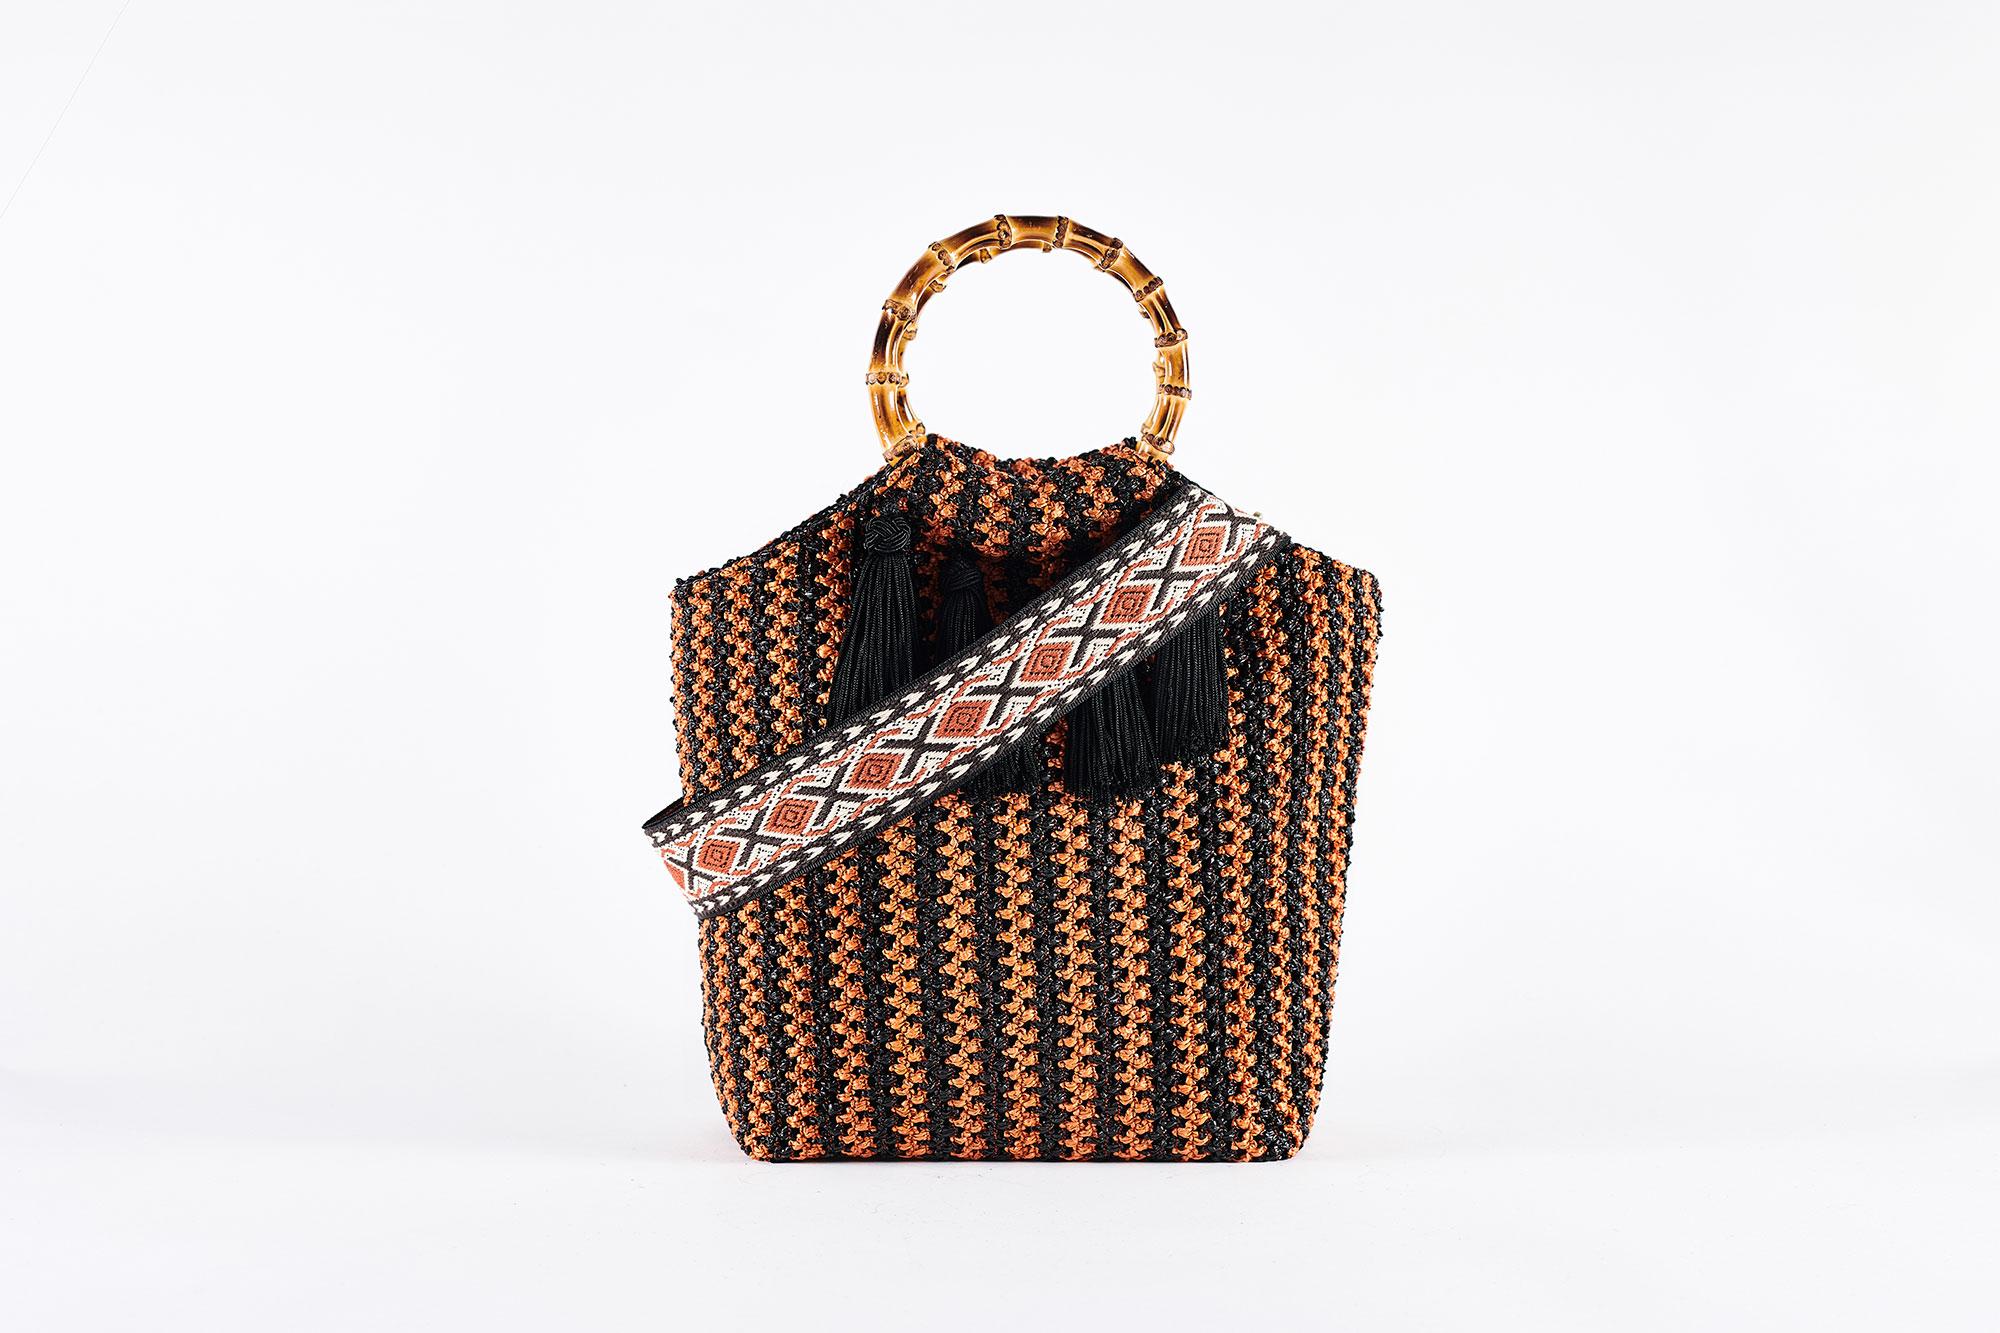 viamailbag-antigua-net-n03